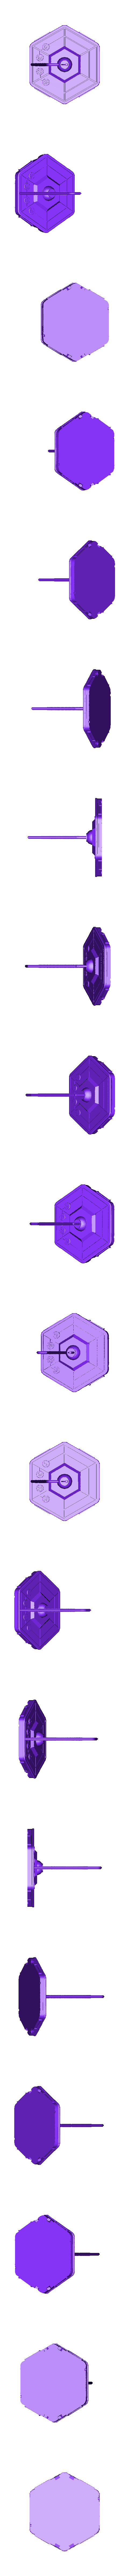 kataan_2_with_hole.stl Download free STL file Kataan Probe • 3D printable design, poblocki1982